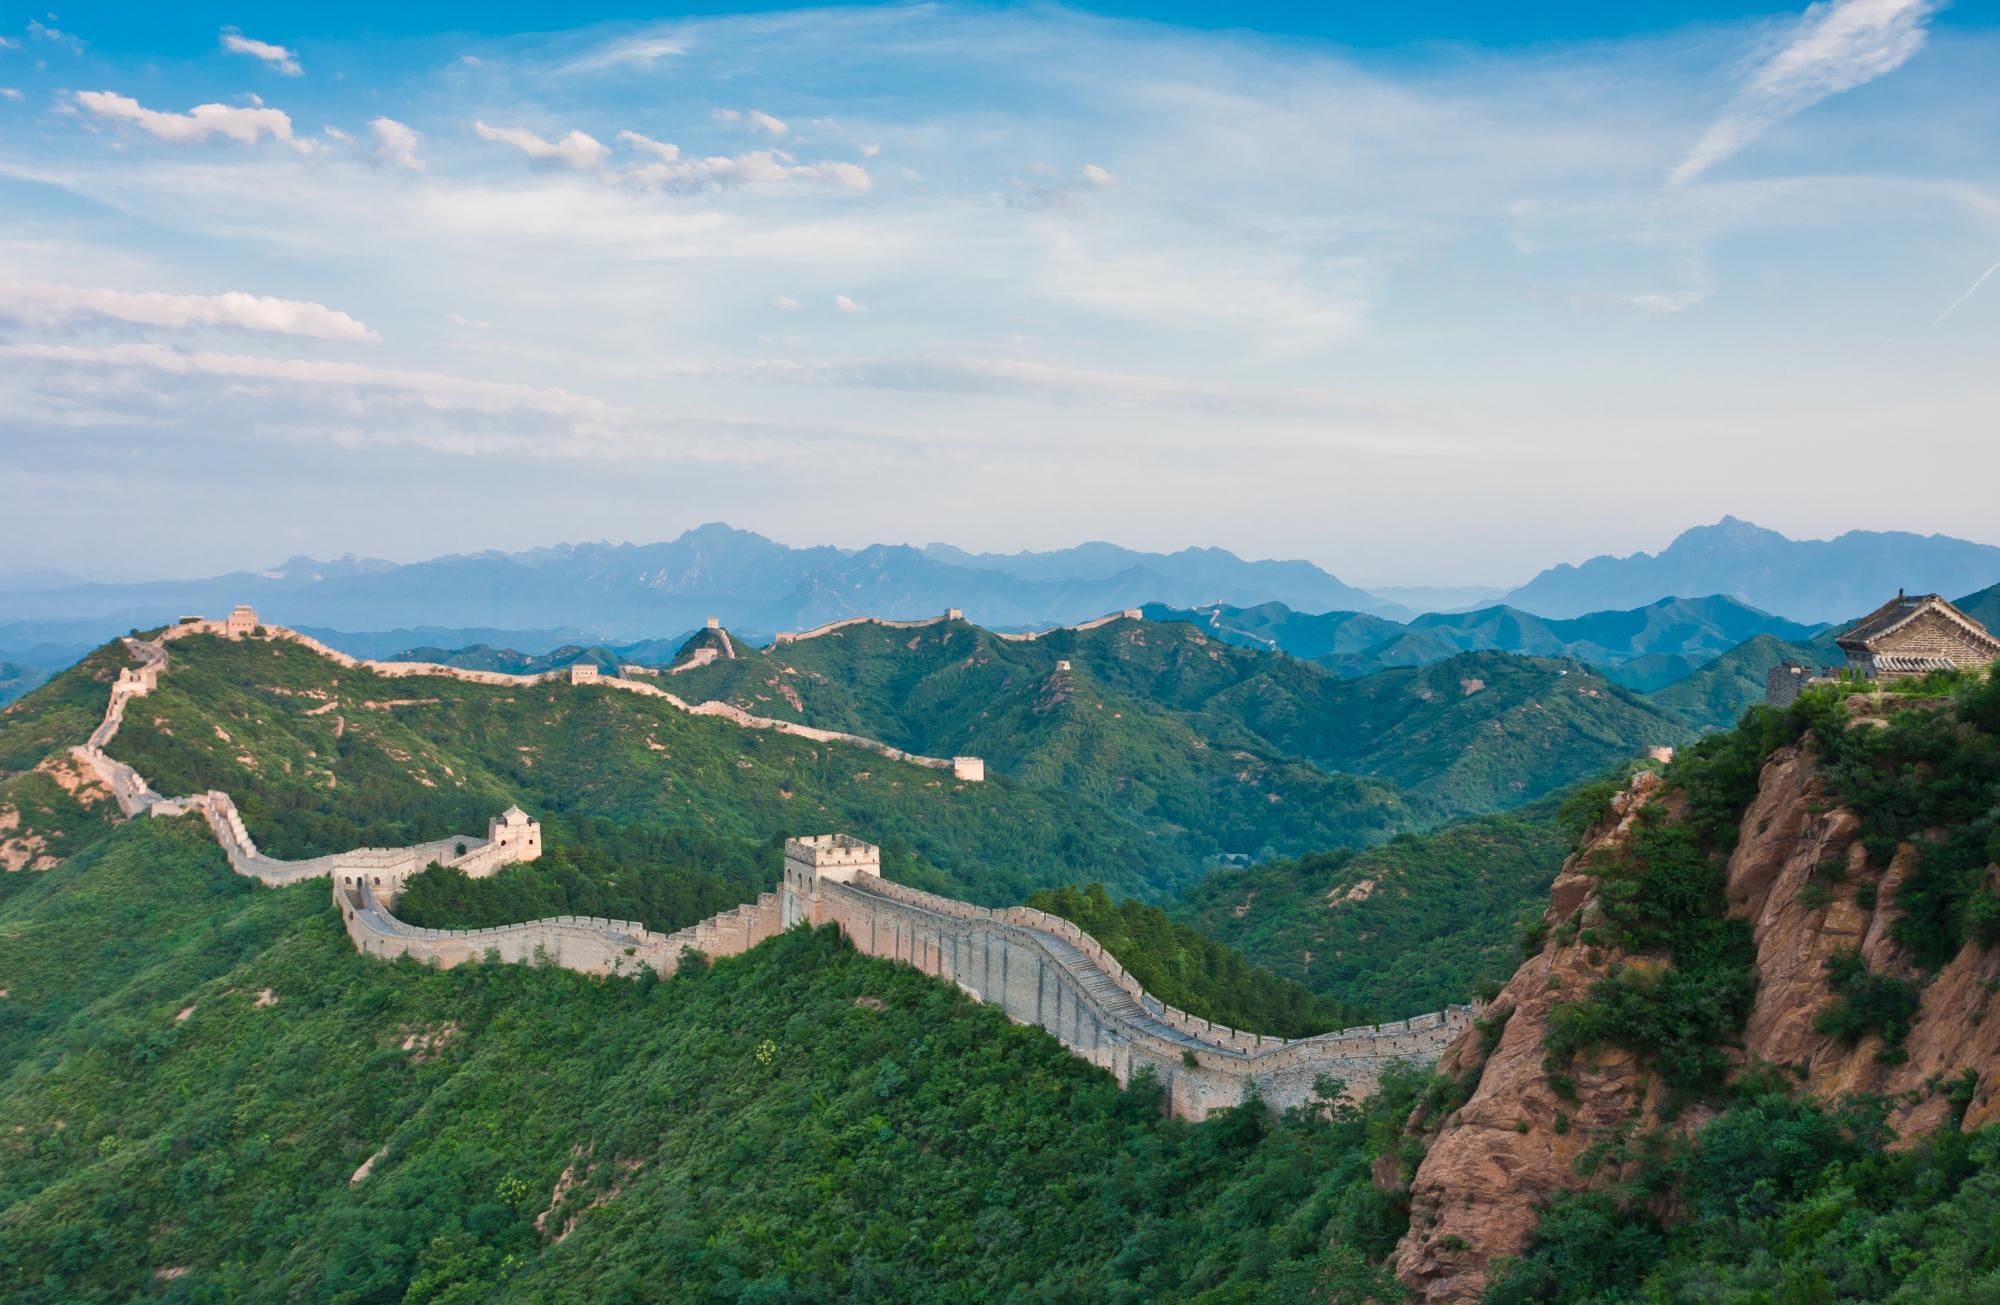 General Tours China